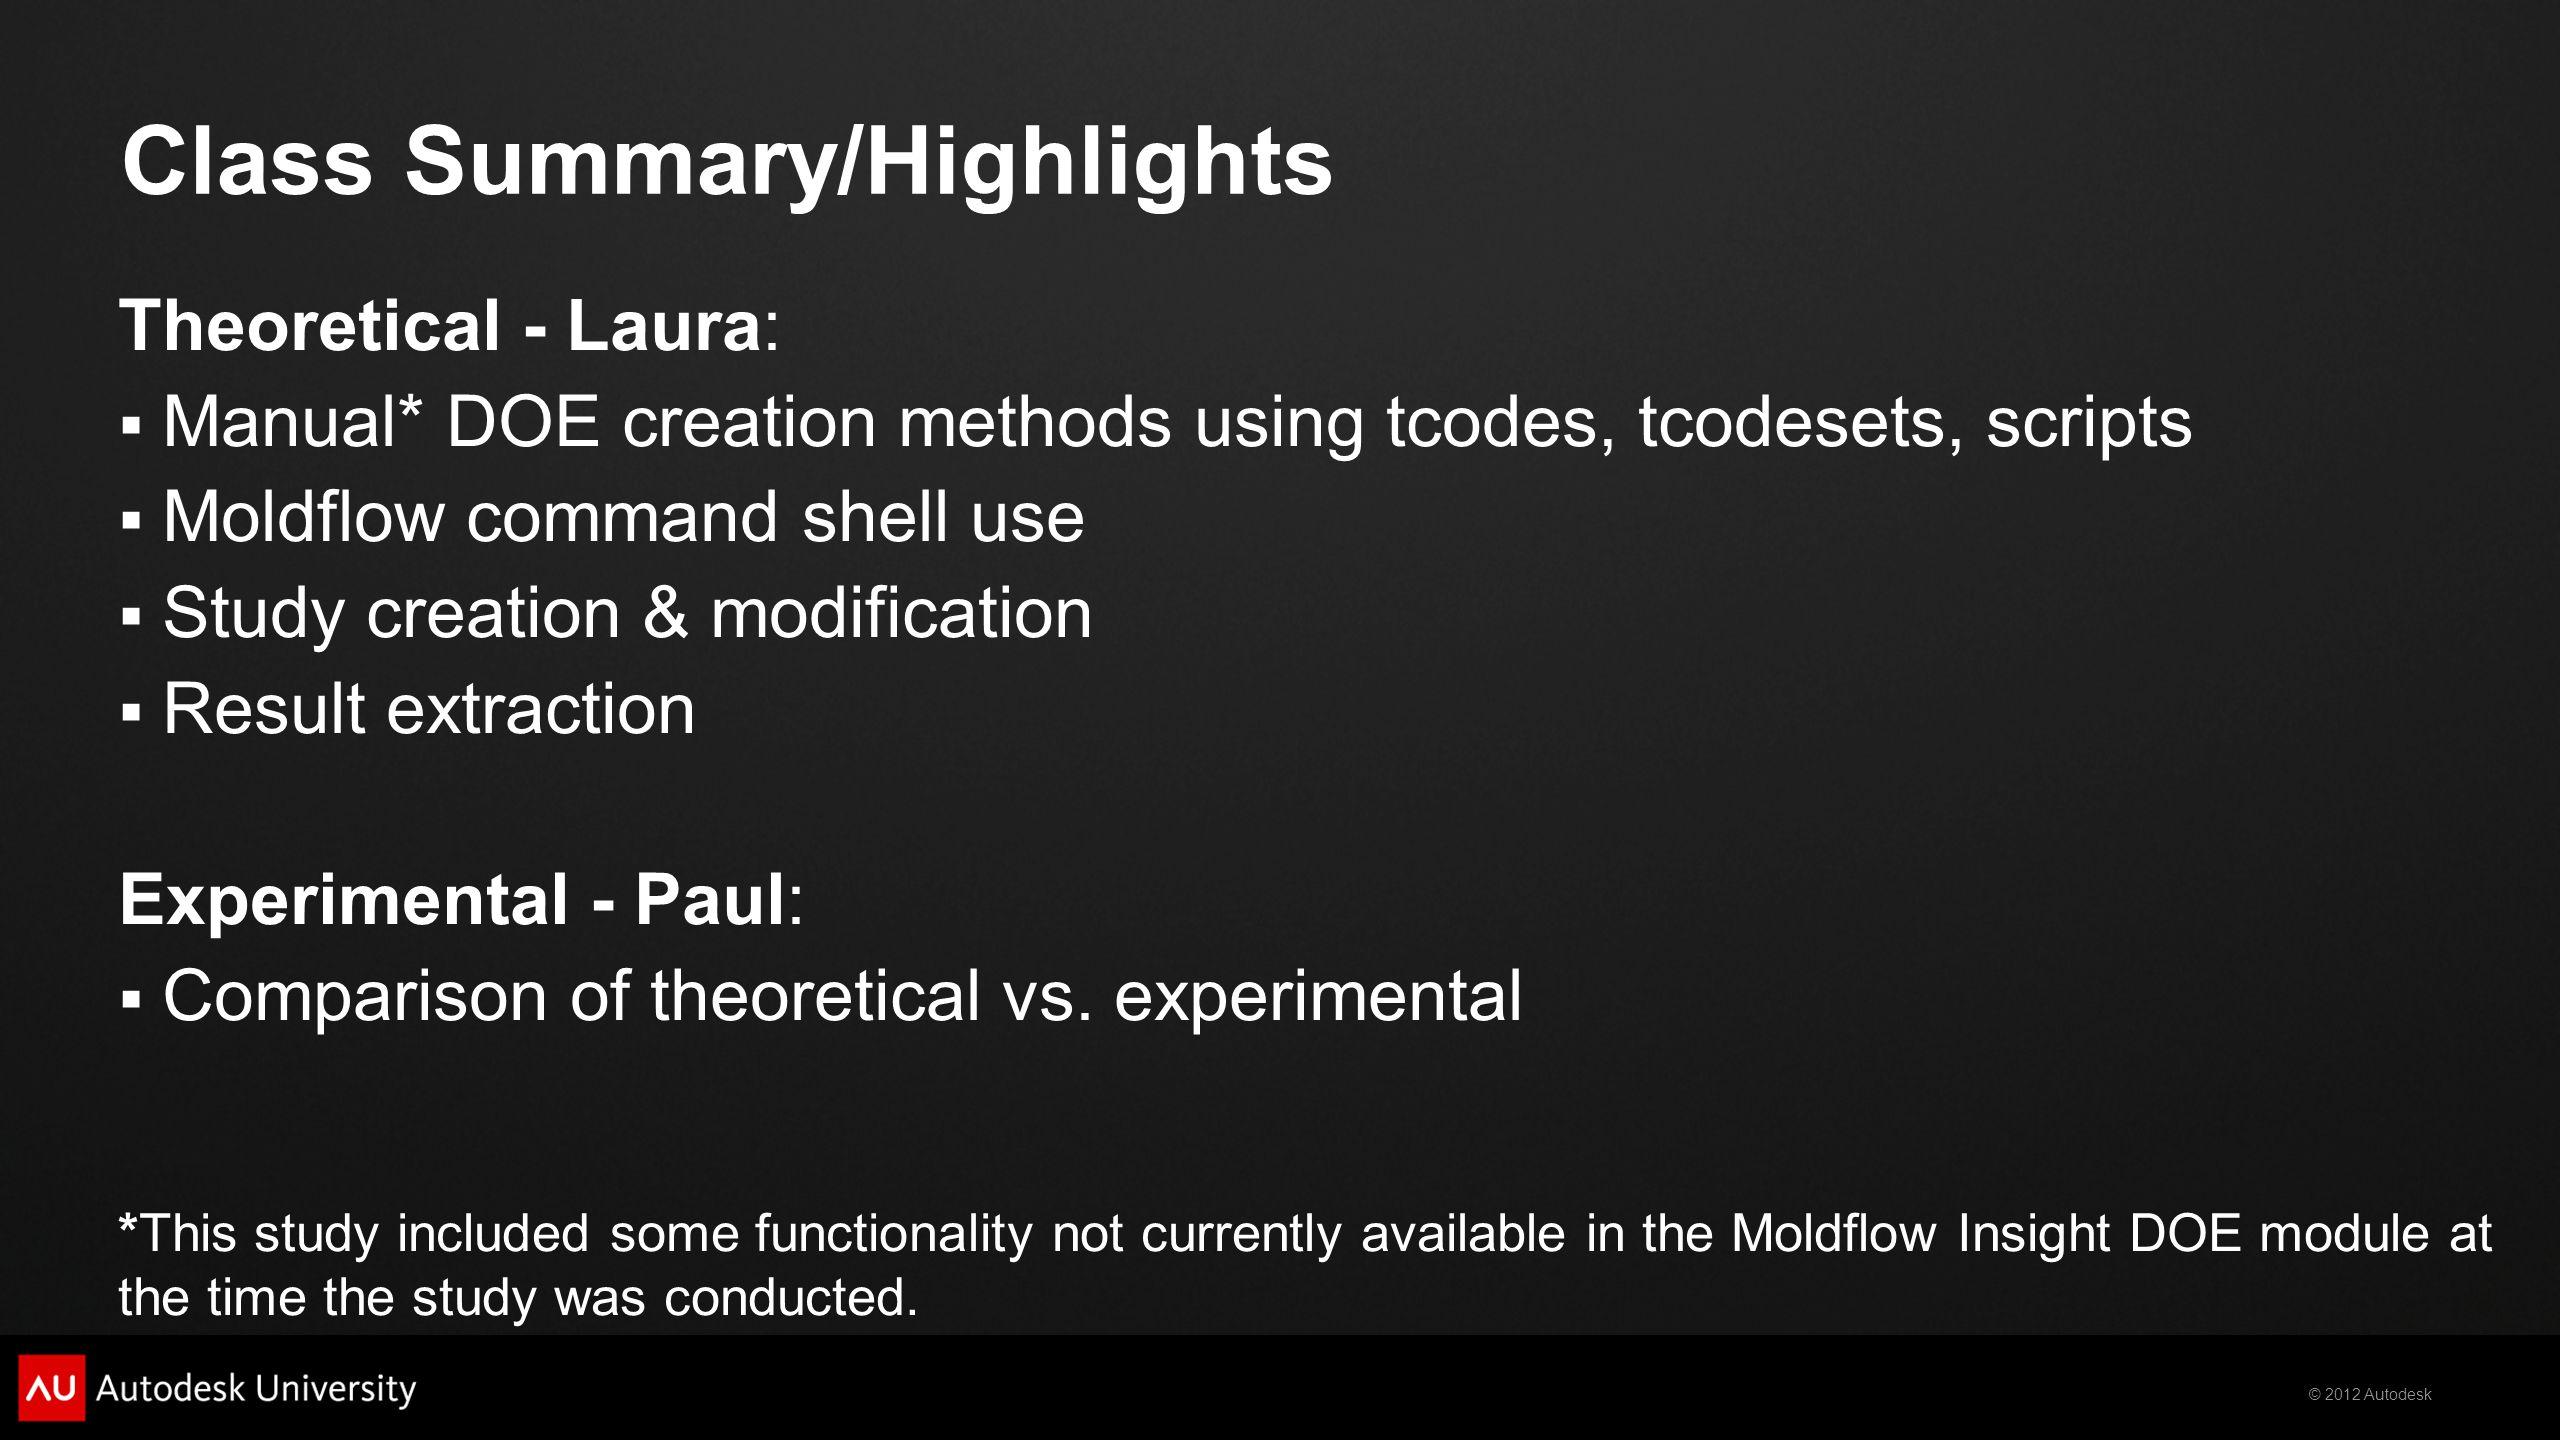 Class Summary/Highlights